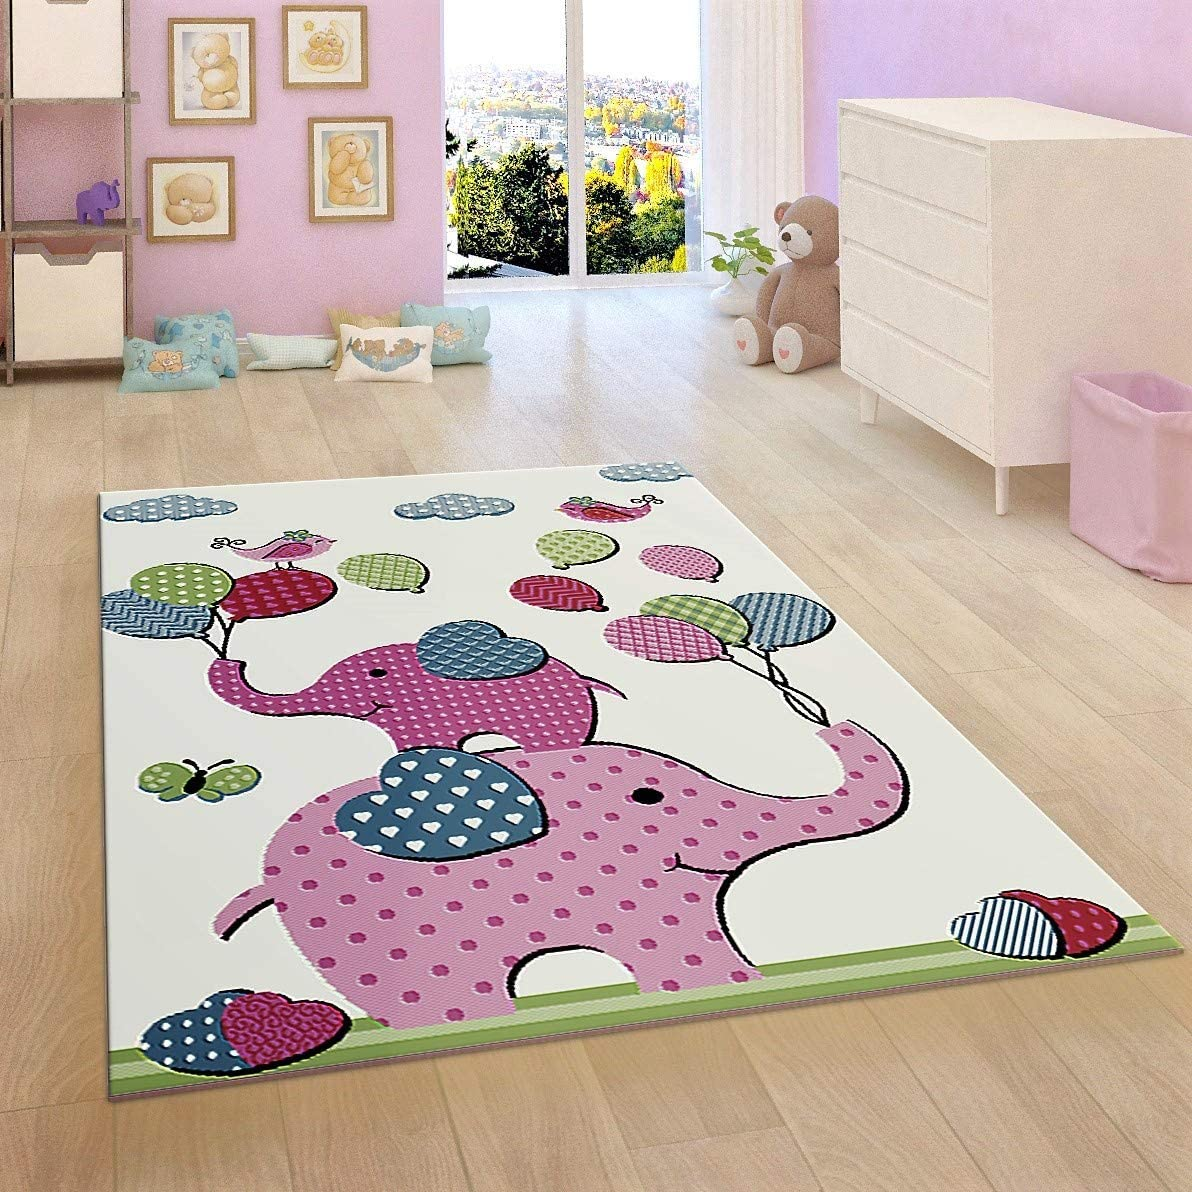 26x5 ft Woven Mat Low Pile Carpet for Baby Playroom /& Bedroom Kids Children Nursery White Cream Rug Elephant 80x150 cm